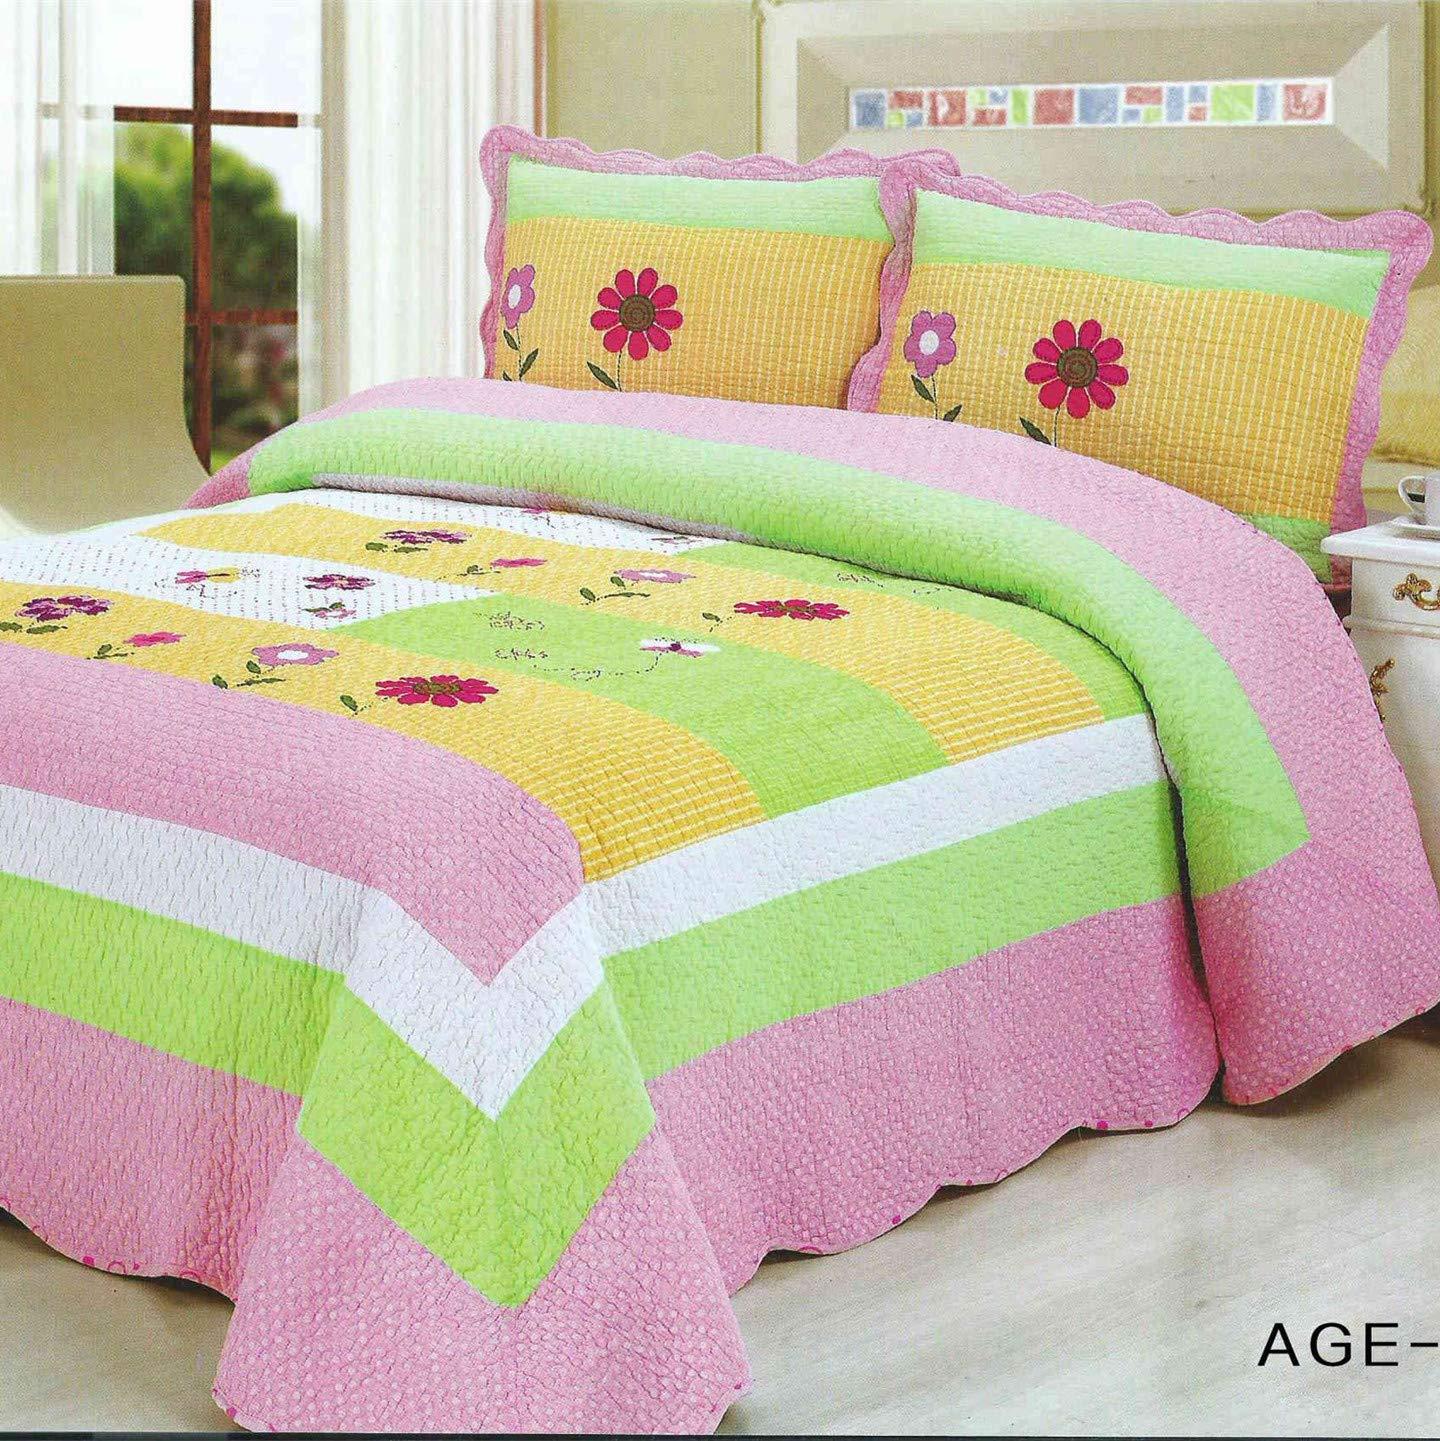 Brandream Kids Twin Size 100% Cotton Girls Bed Set Pink Green Flower  Patchwork Quilts 2-Piece